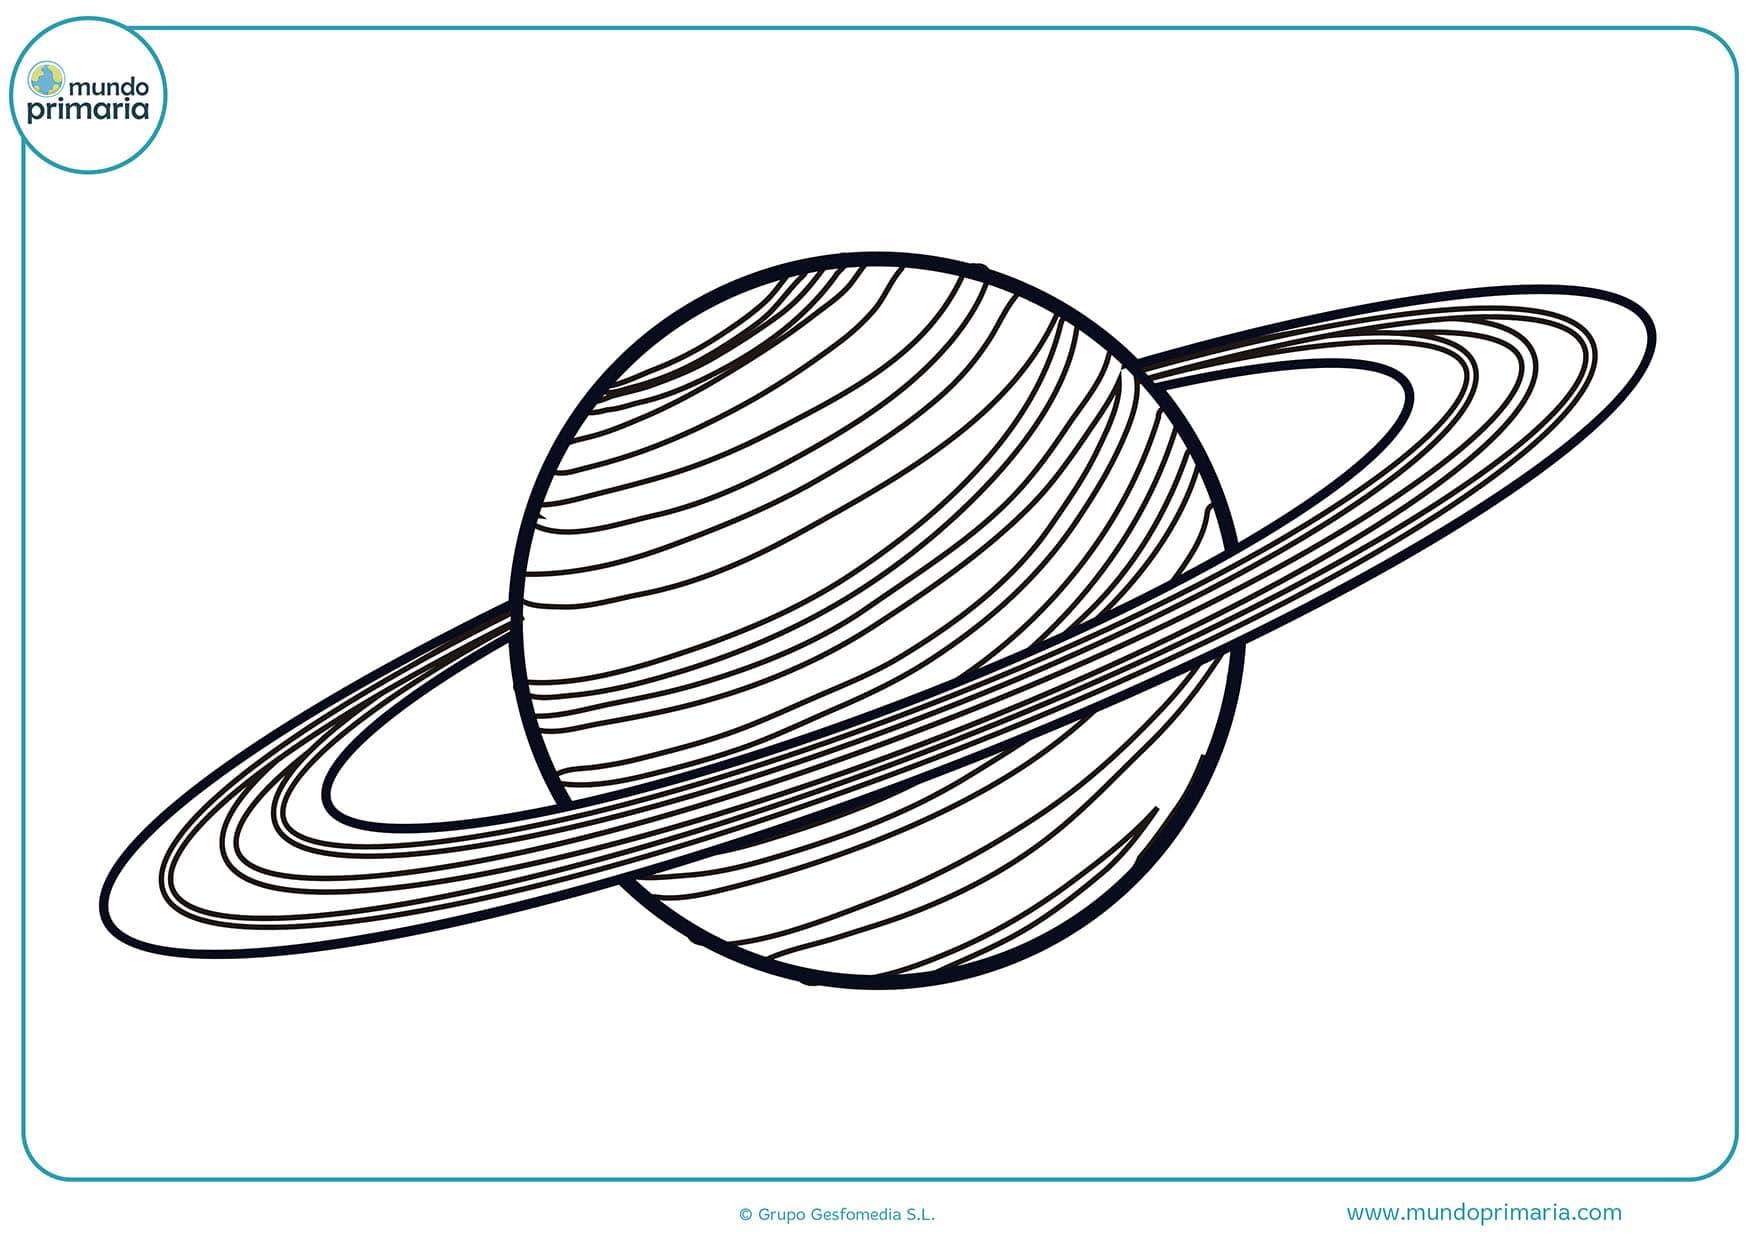 Dibujos planetas colorear